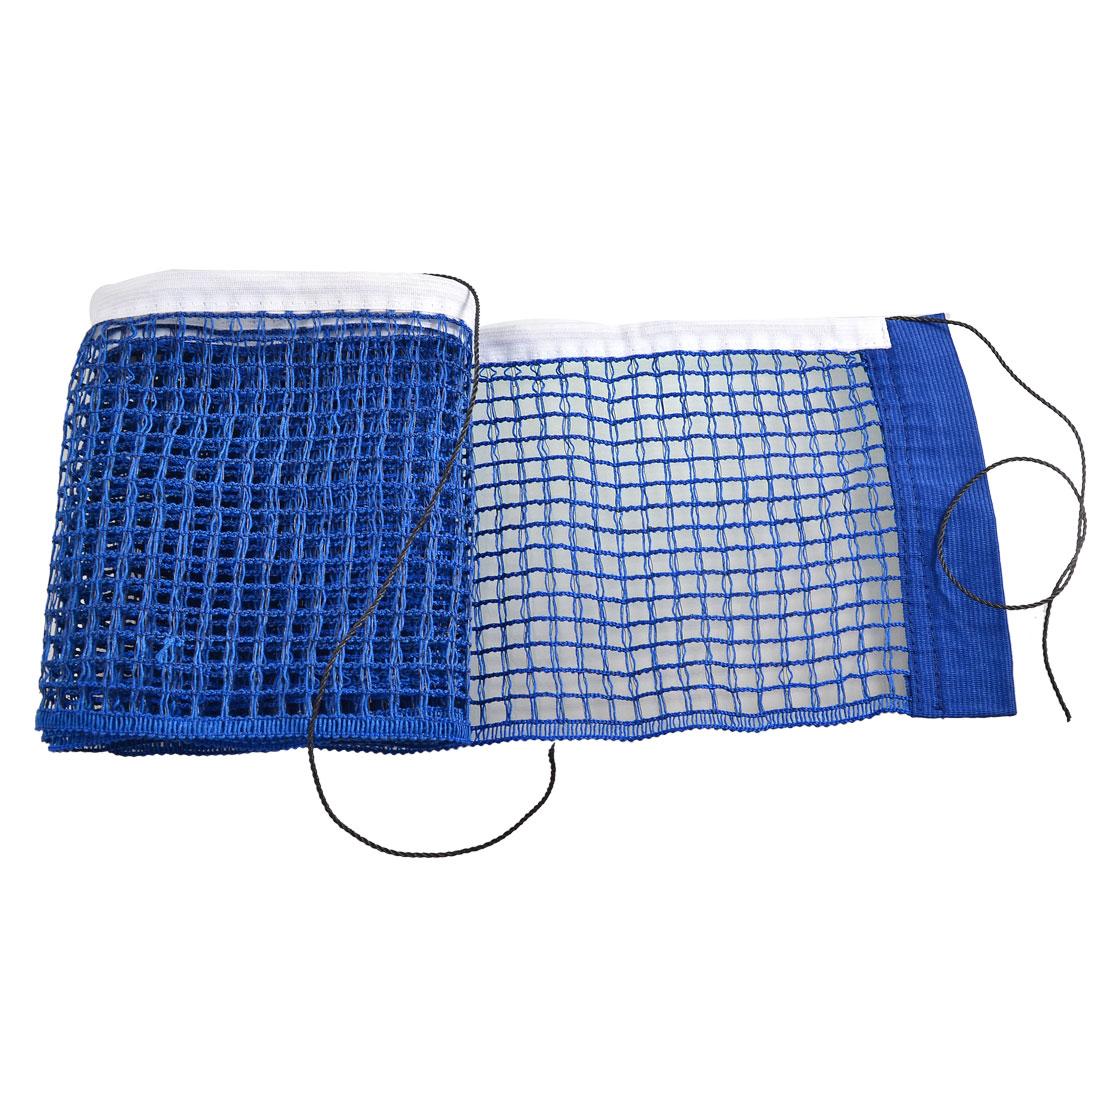 Blue Nylon 1.8M Long 15cm Width Table Tennis Net Organizer